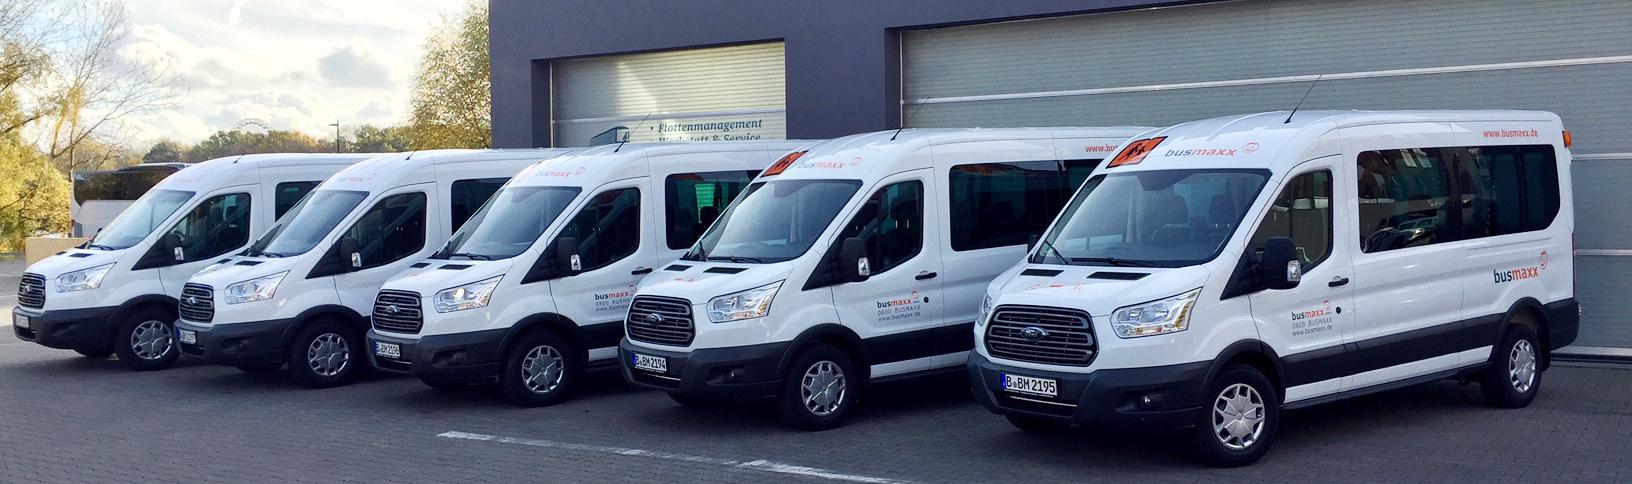 busmaxx Flotte